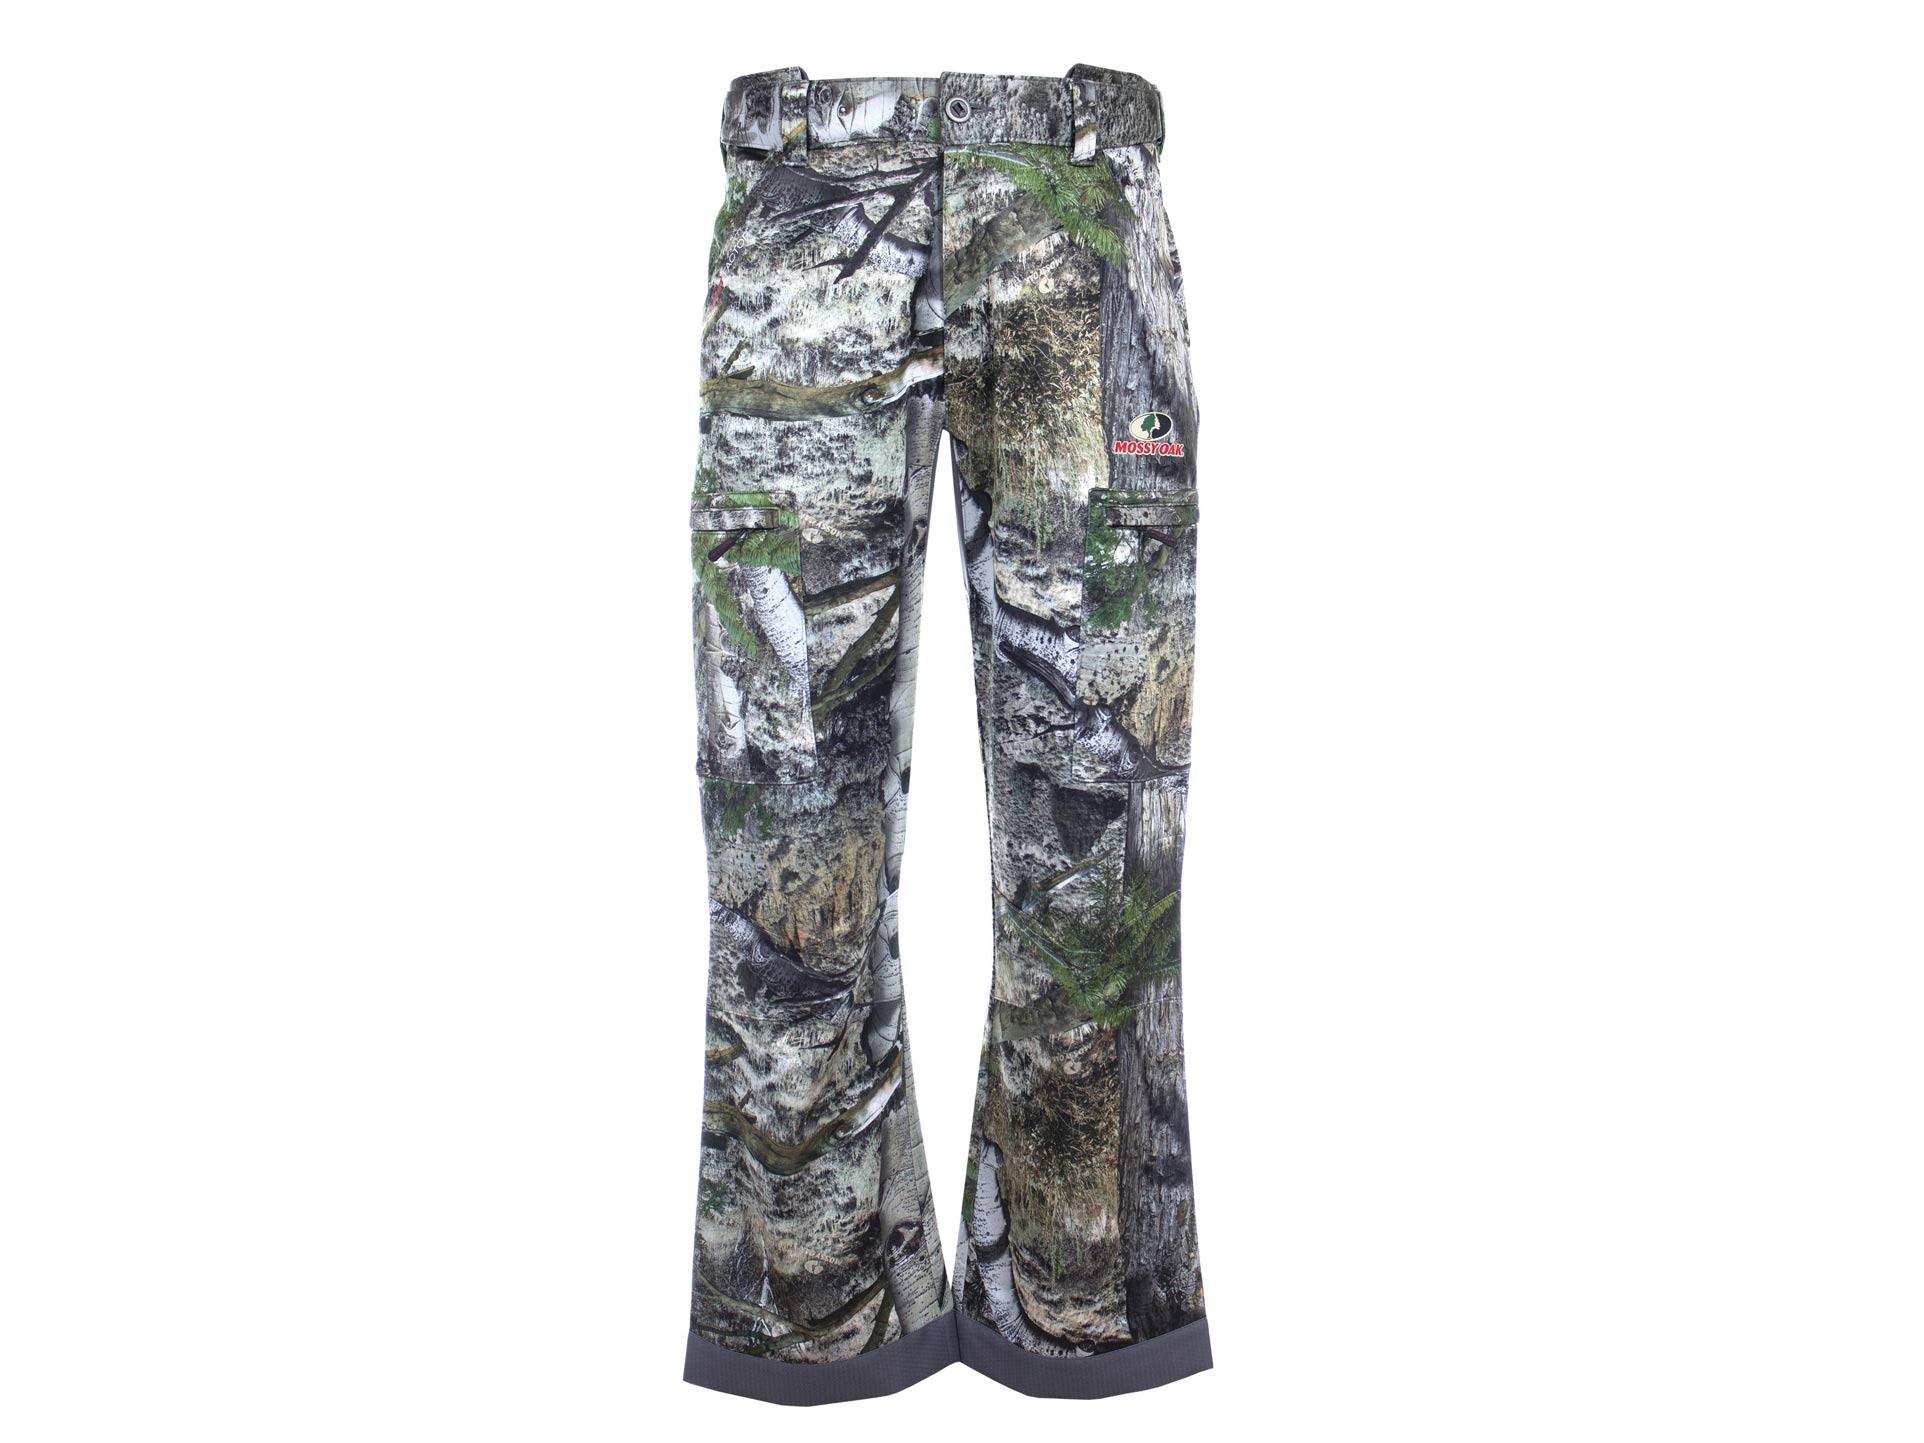 Mossy Oak Mountain Country pattern hunting pants